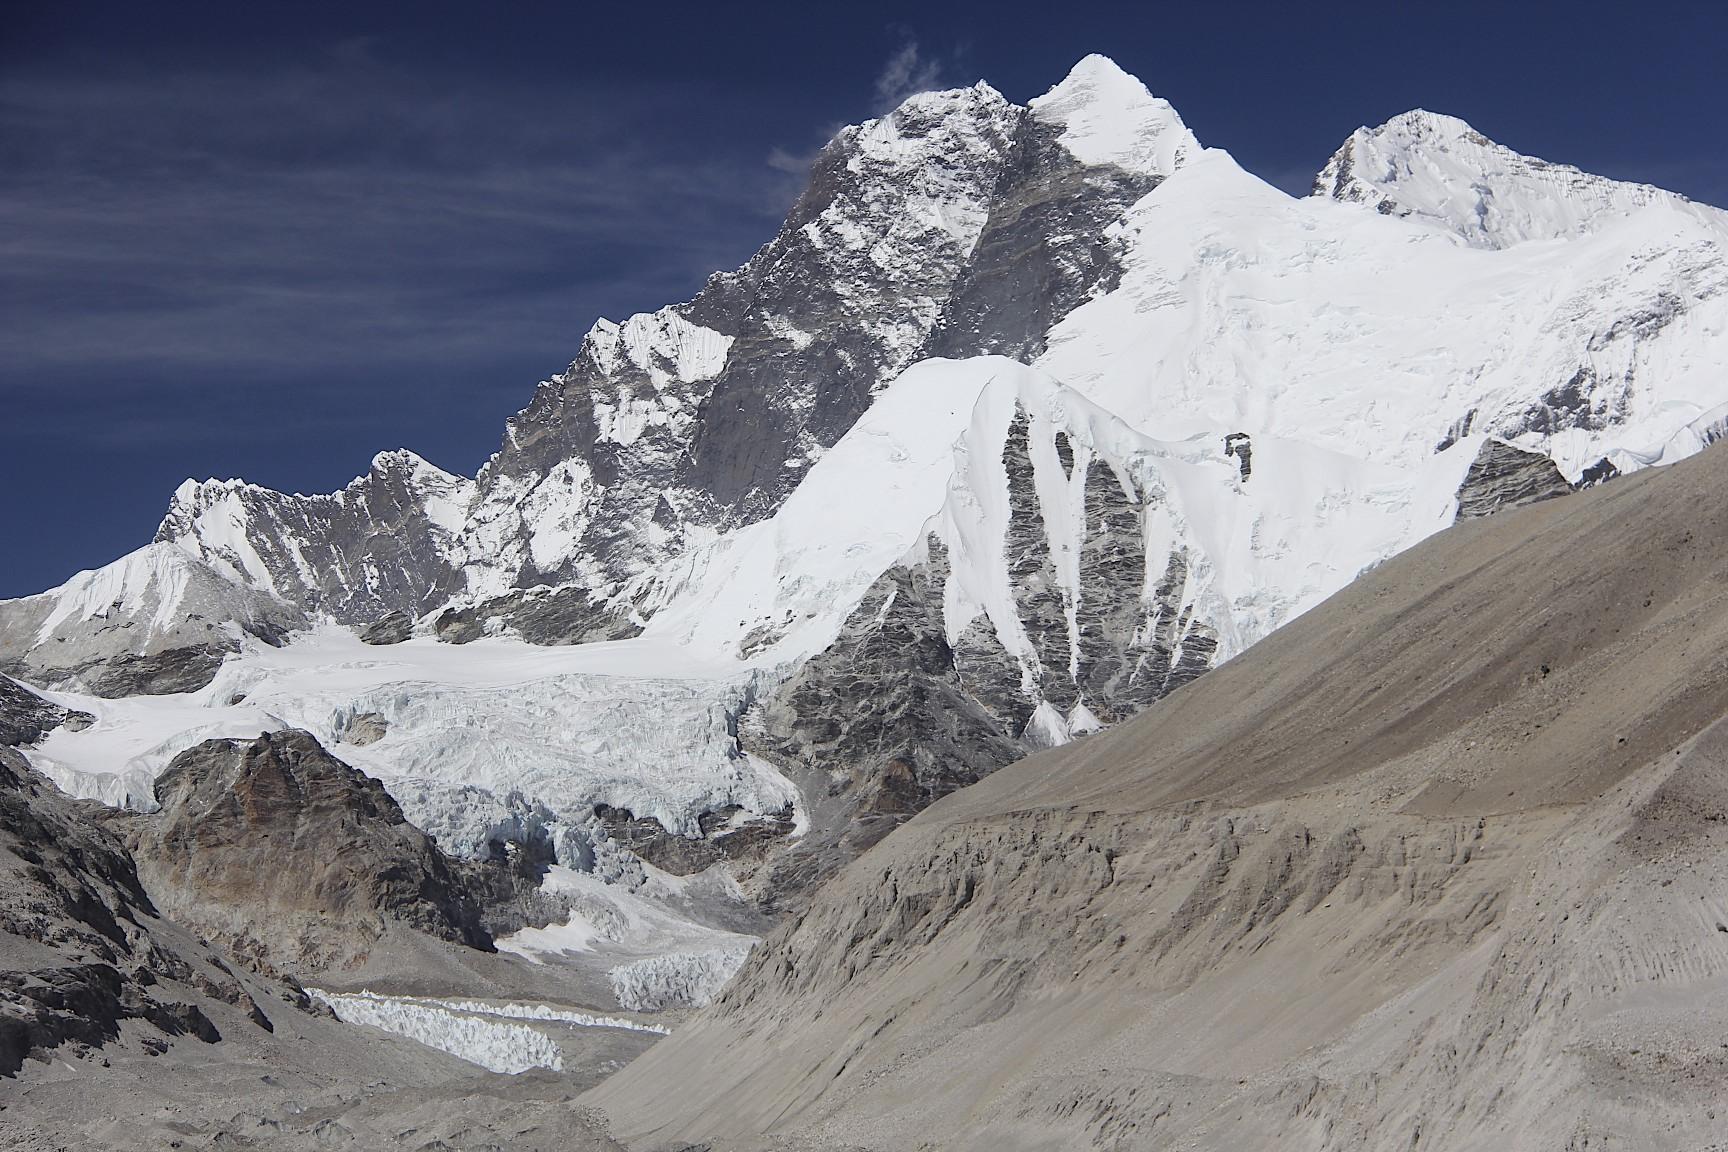 From left to right: Lhotse, Lhotse Shar, Everest